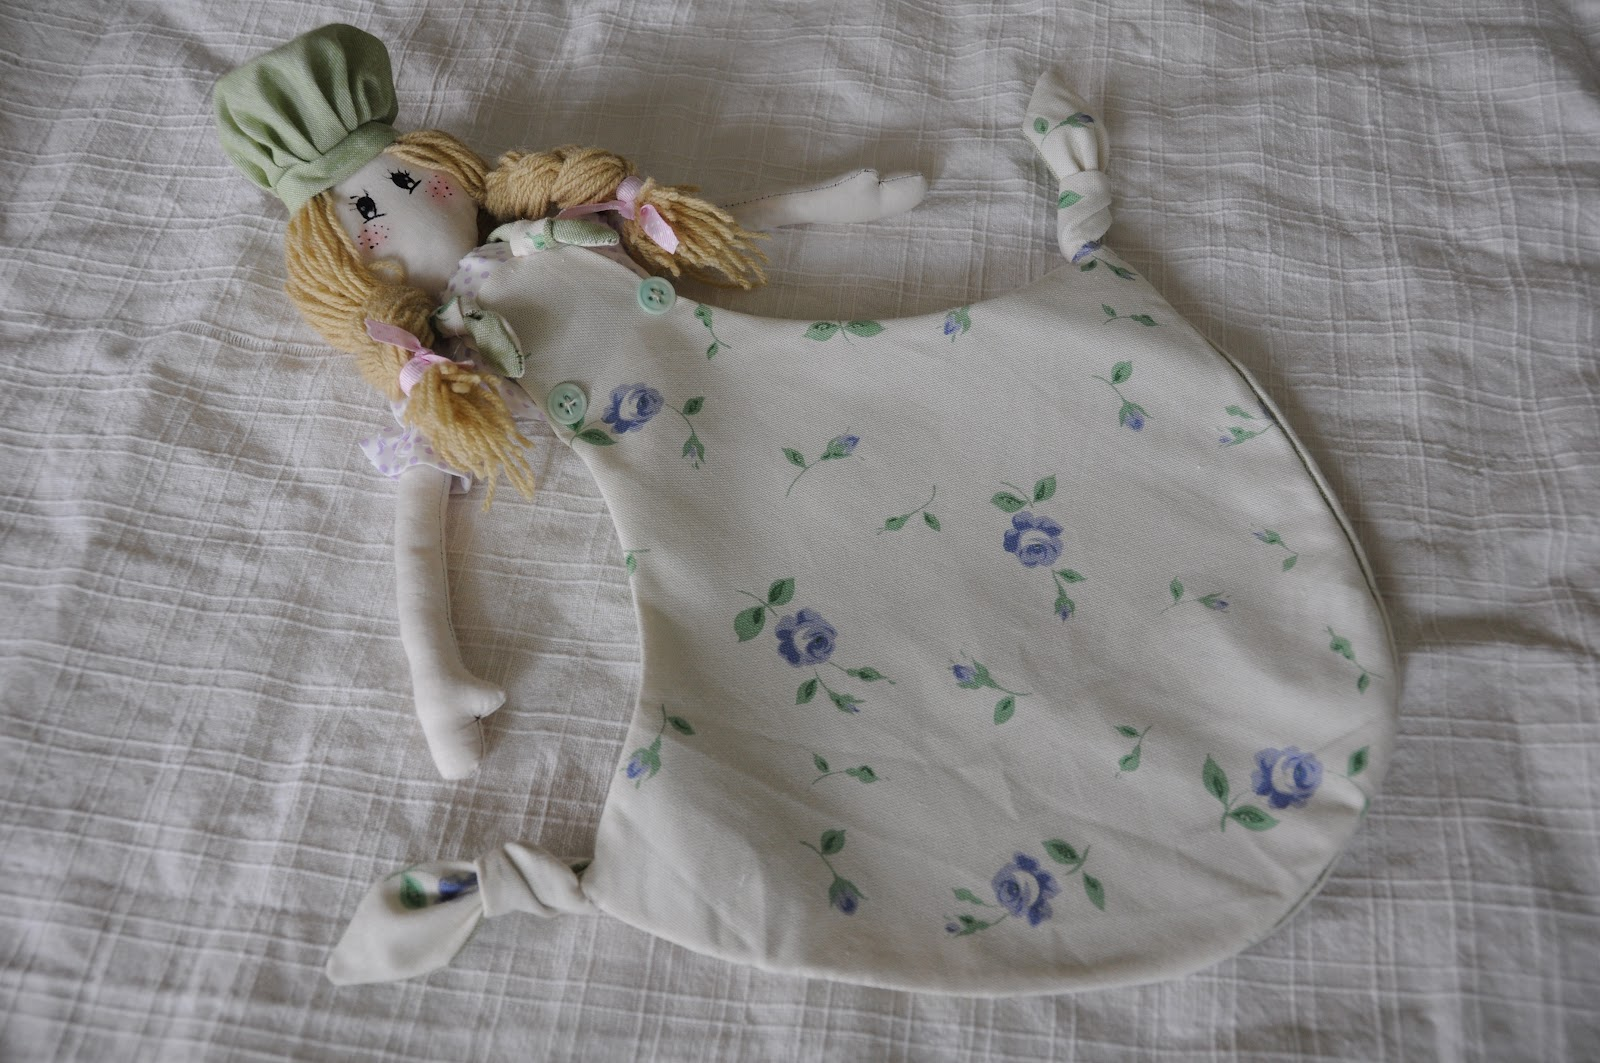 Pensare a pois bambola porta sacchetti - Porta sacchetti ...